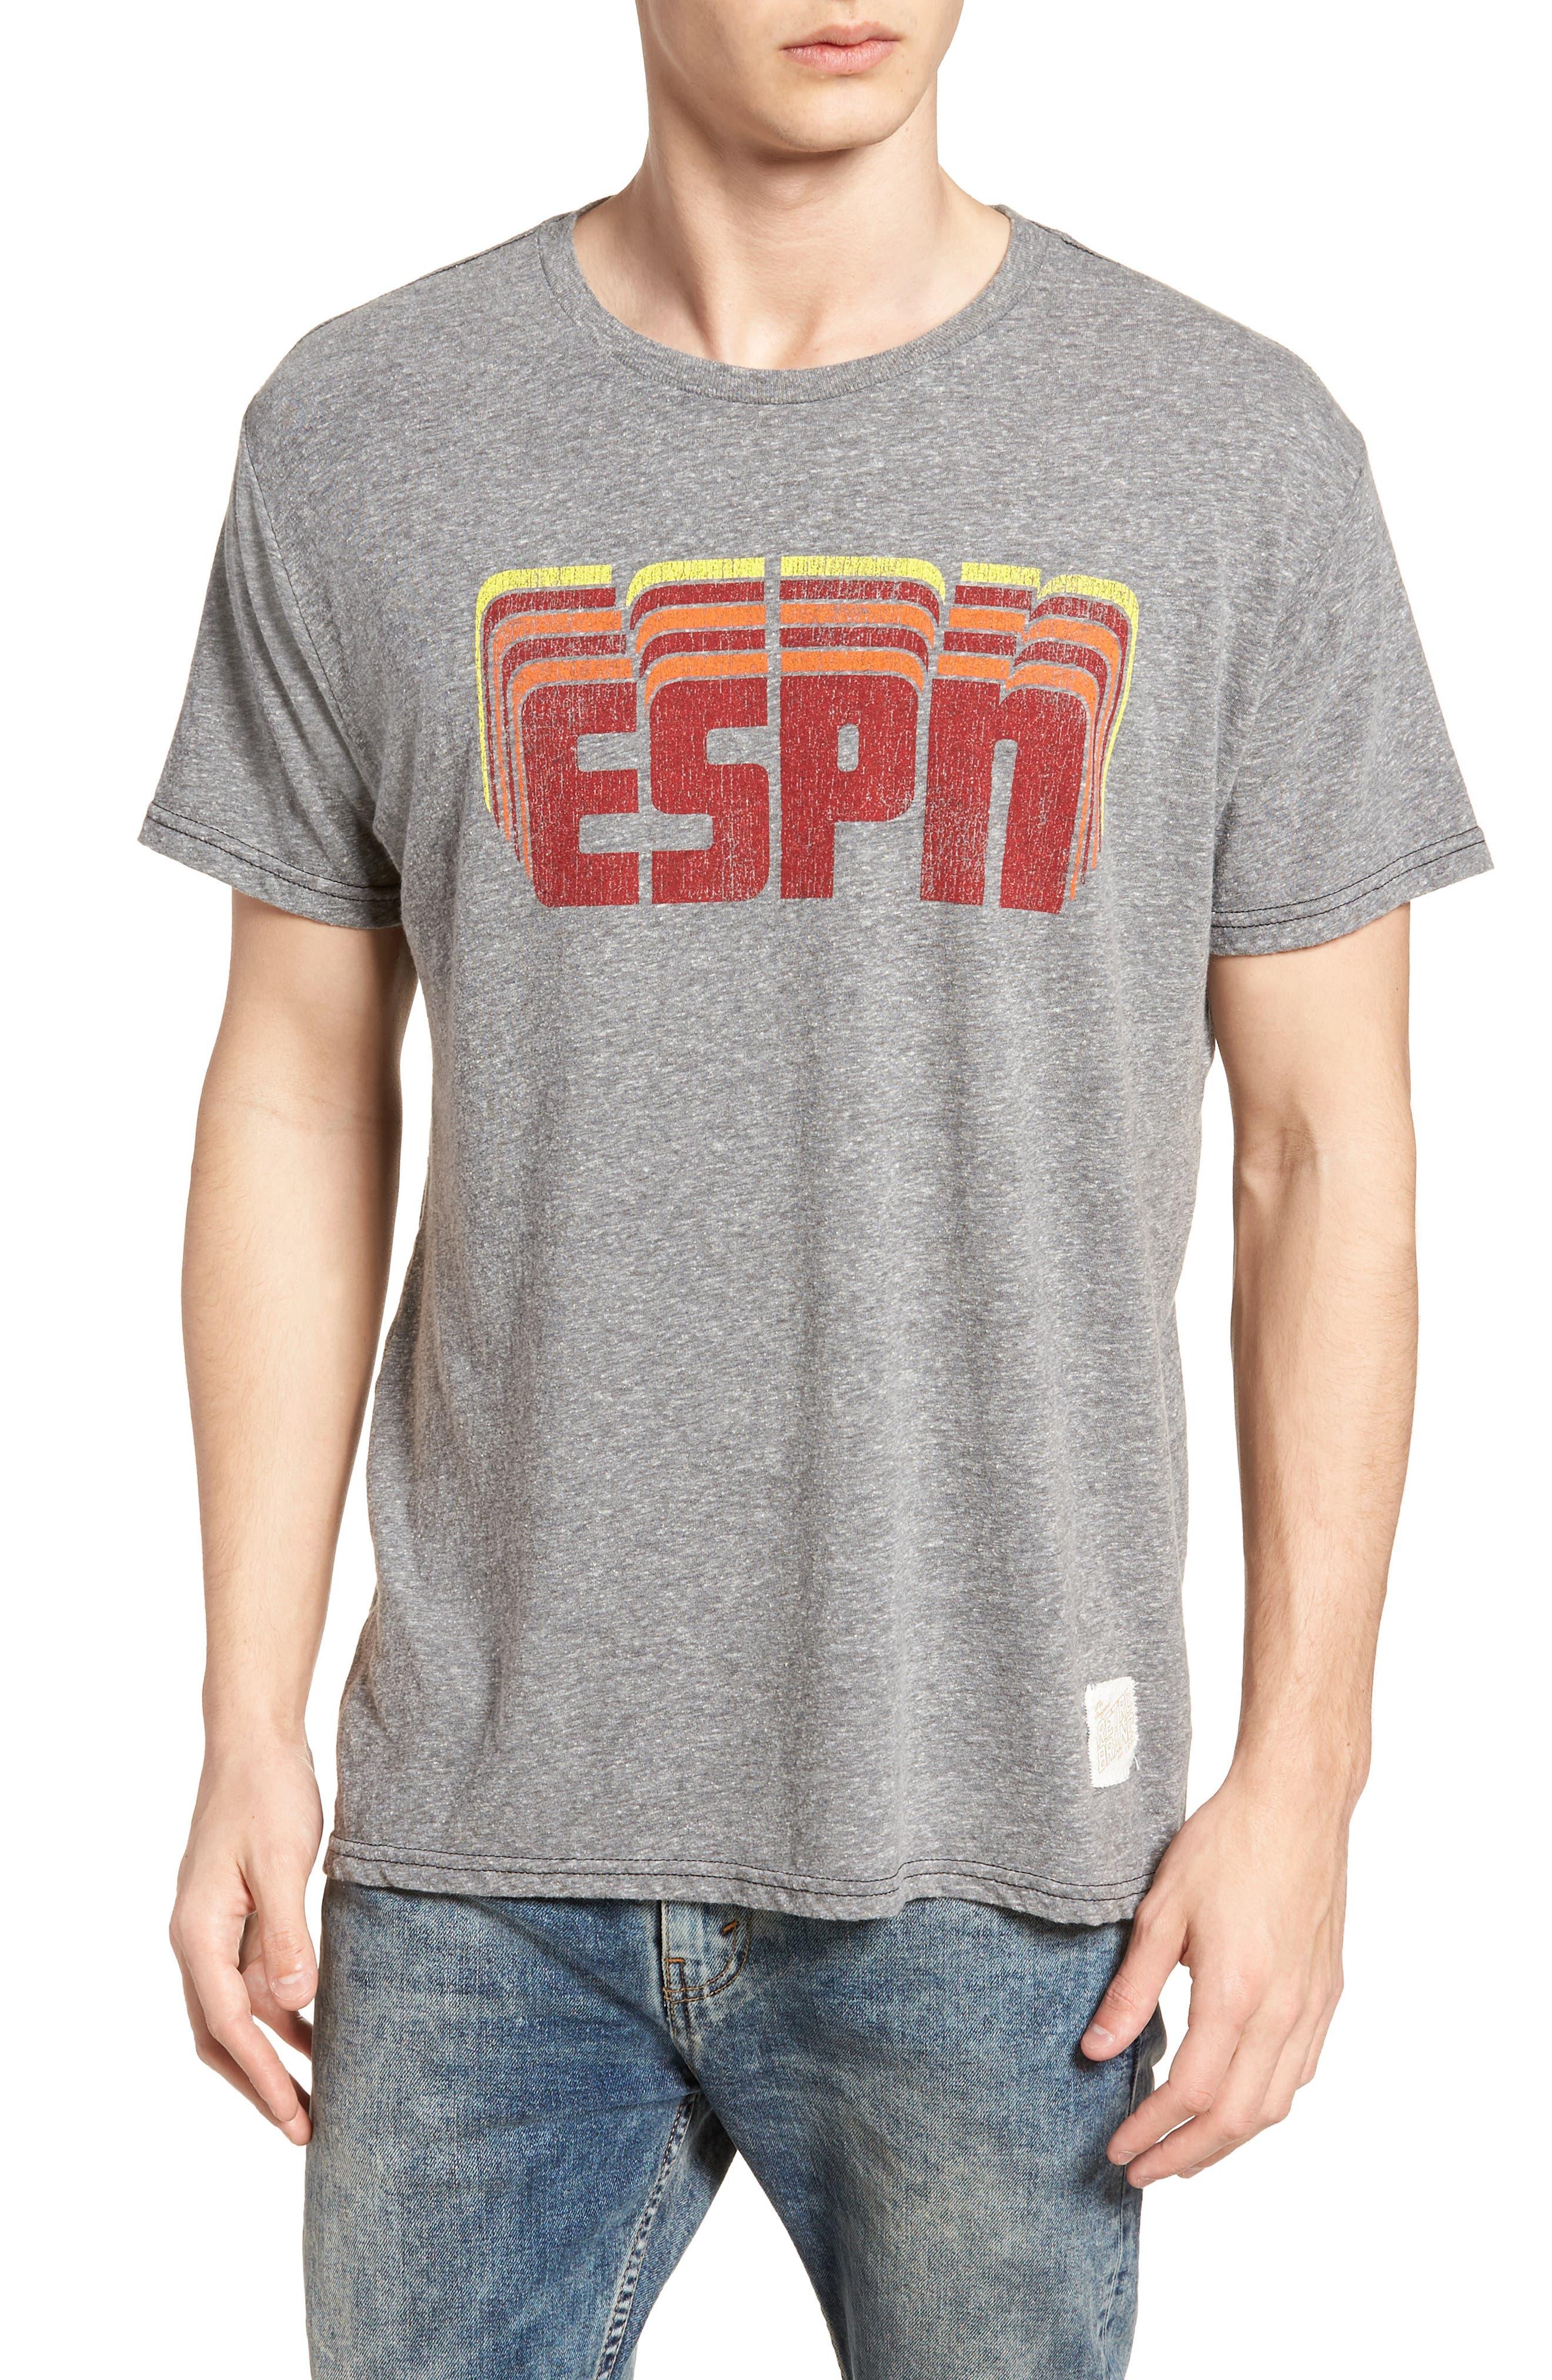 ESPN Graphic T-Shirt,                             Main thumbnail 1, color,                             020